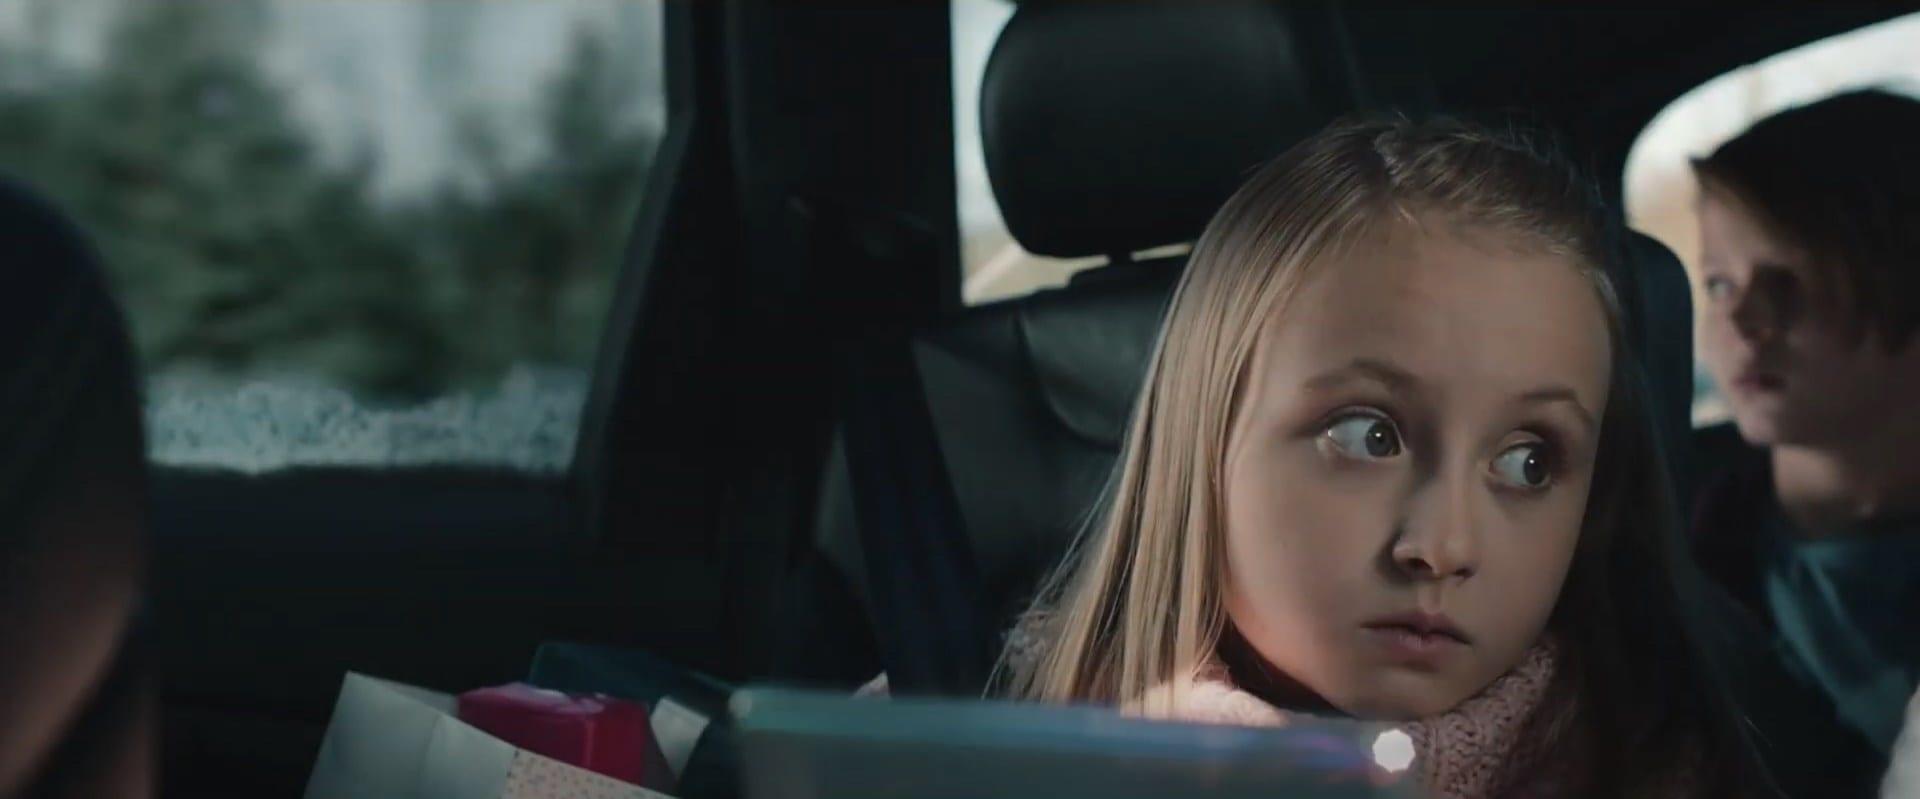 Telekom Christmas Ad Hallelujah